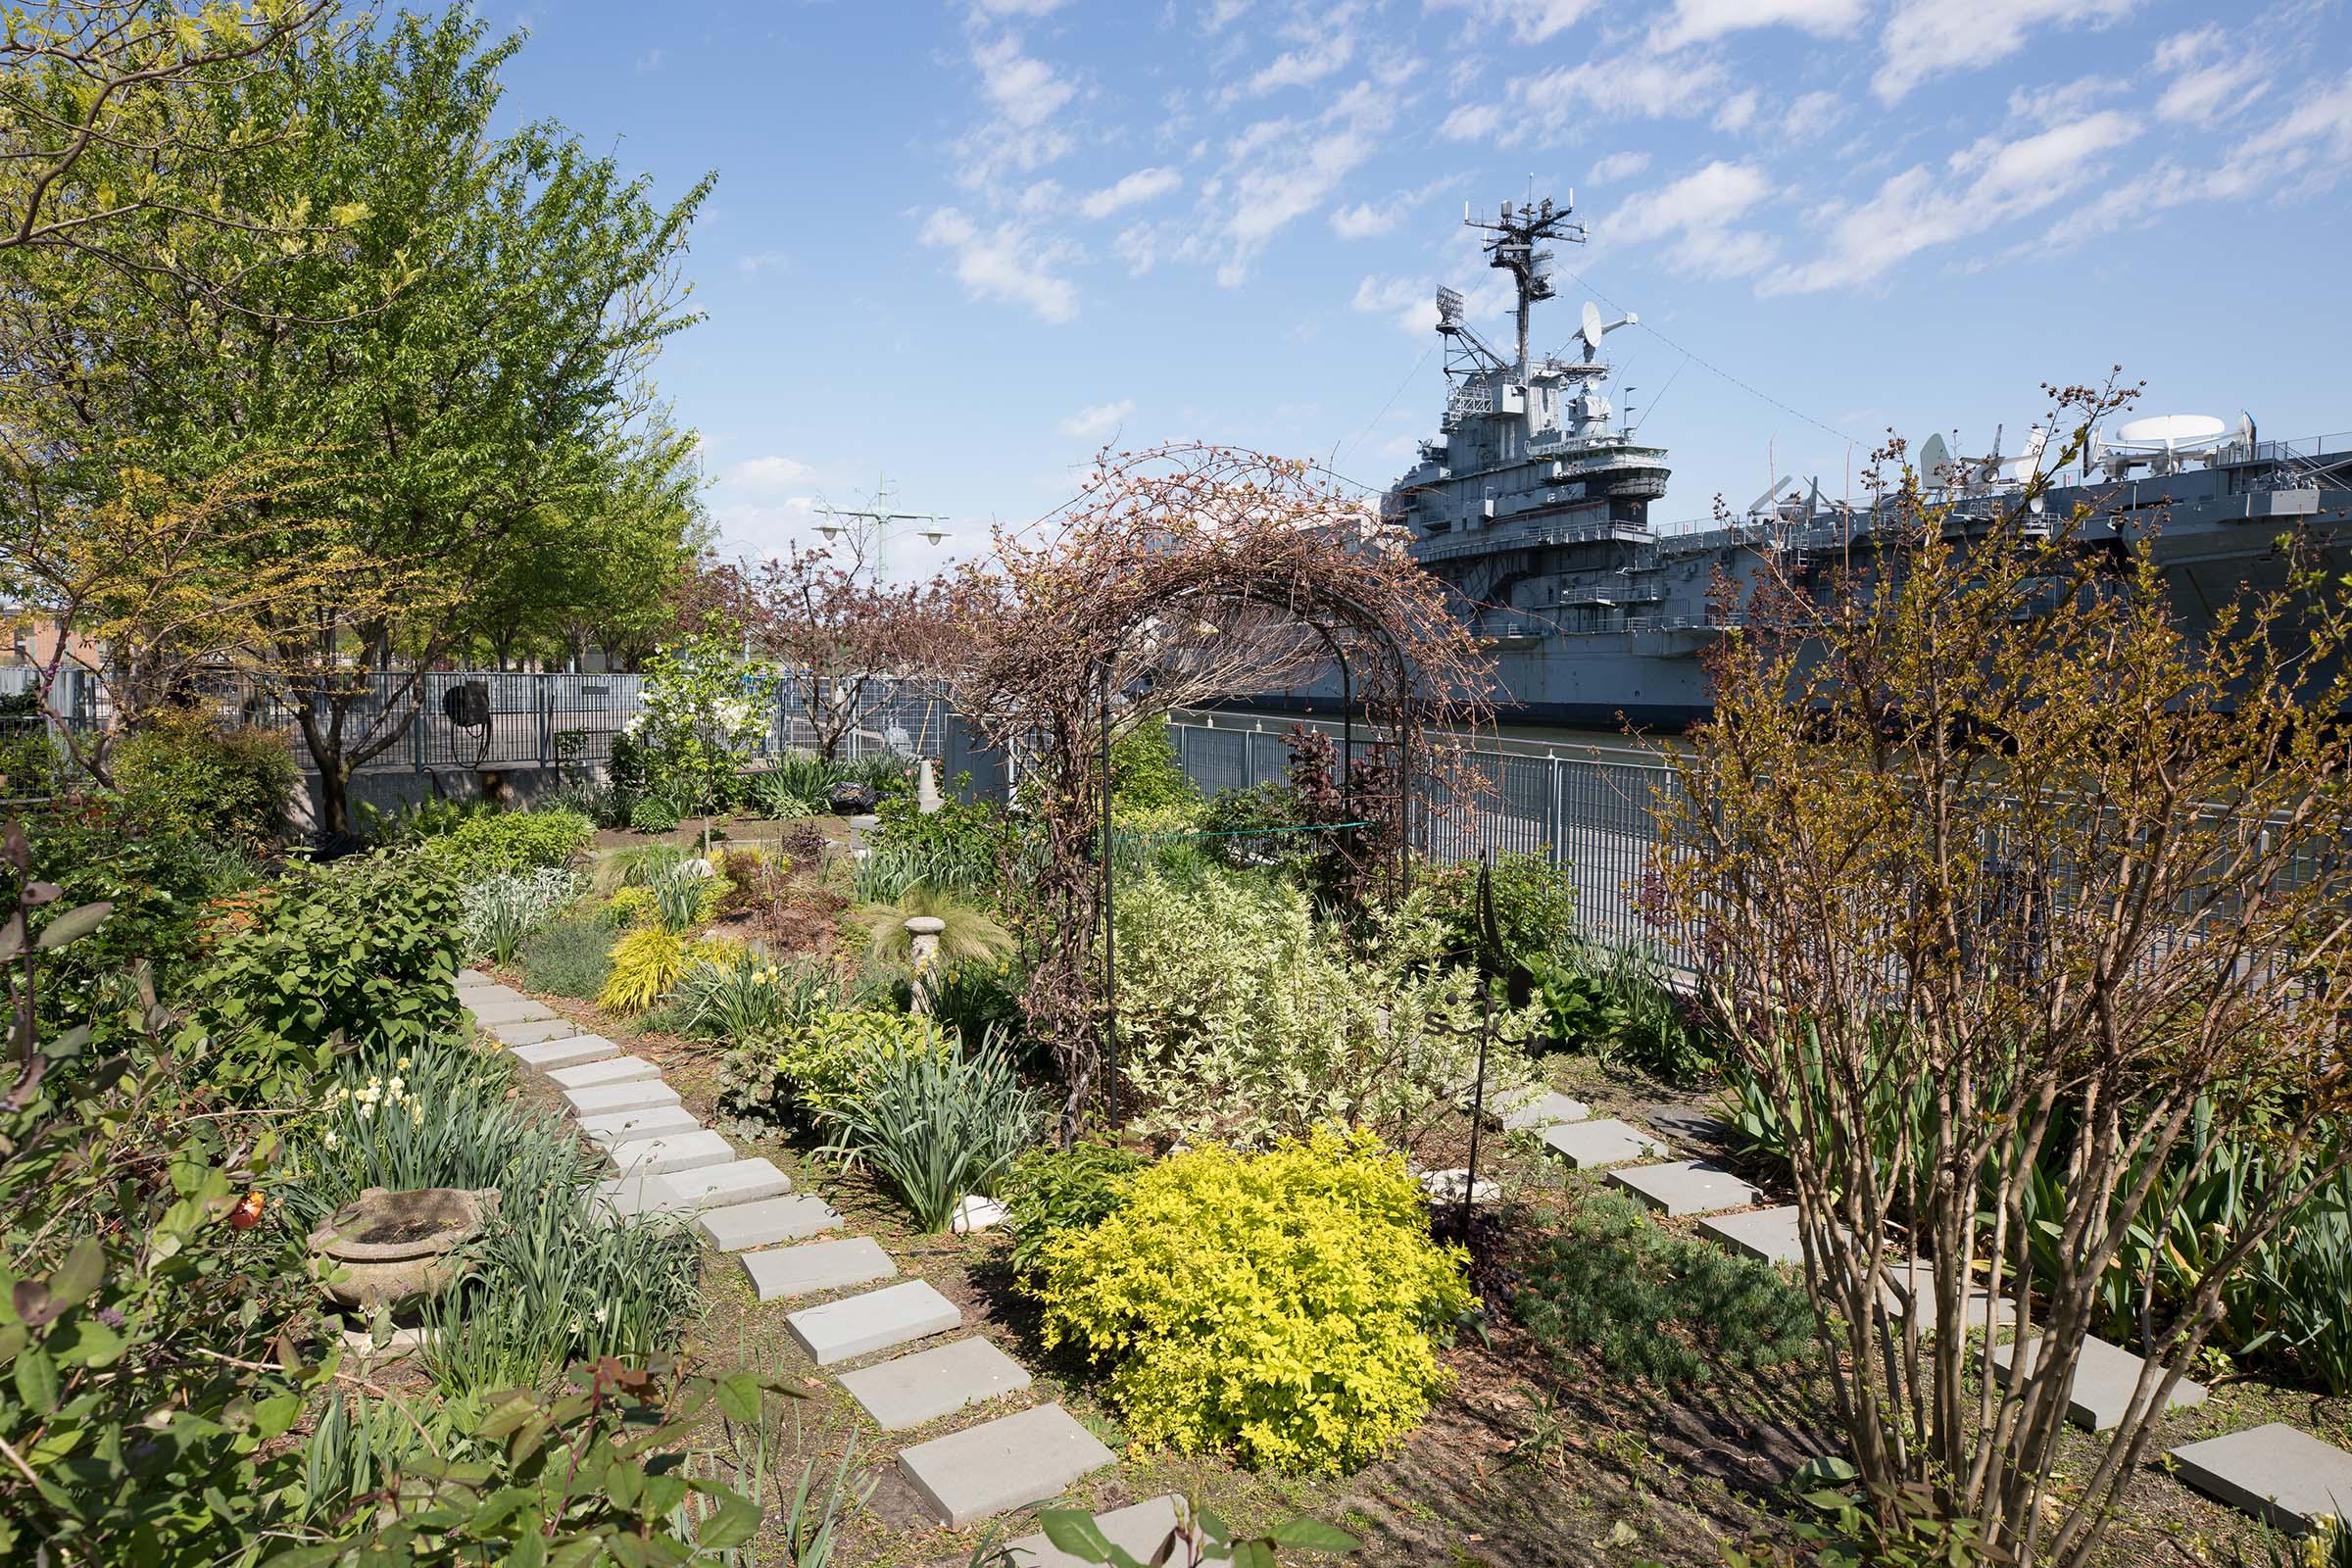 An oval trellis is a centerpiece in the community garden